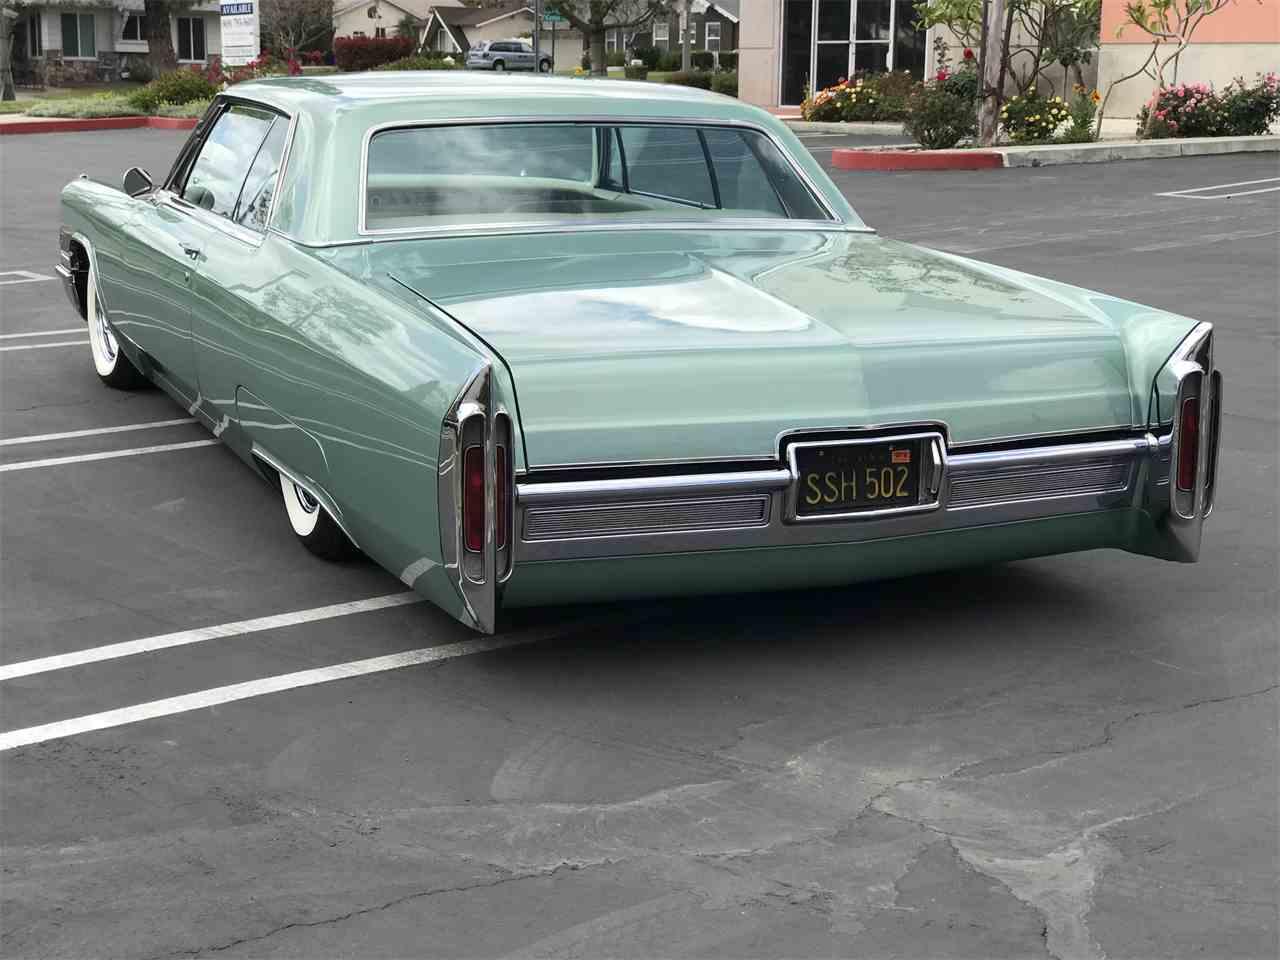 1966 Cadillac Coupe DeVille for Sale | ClassicCars.com ...